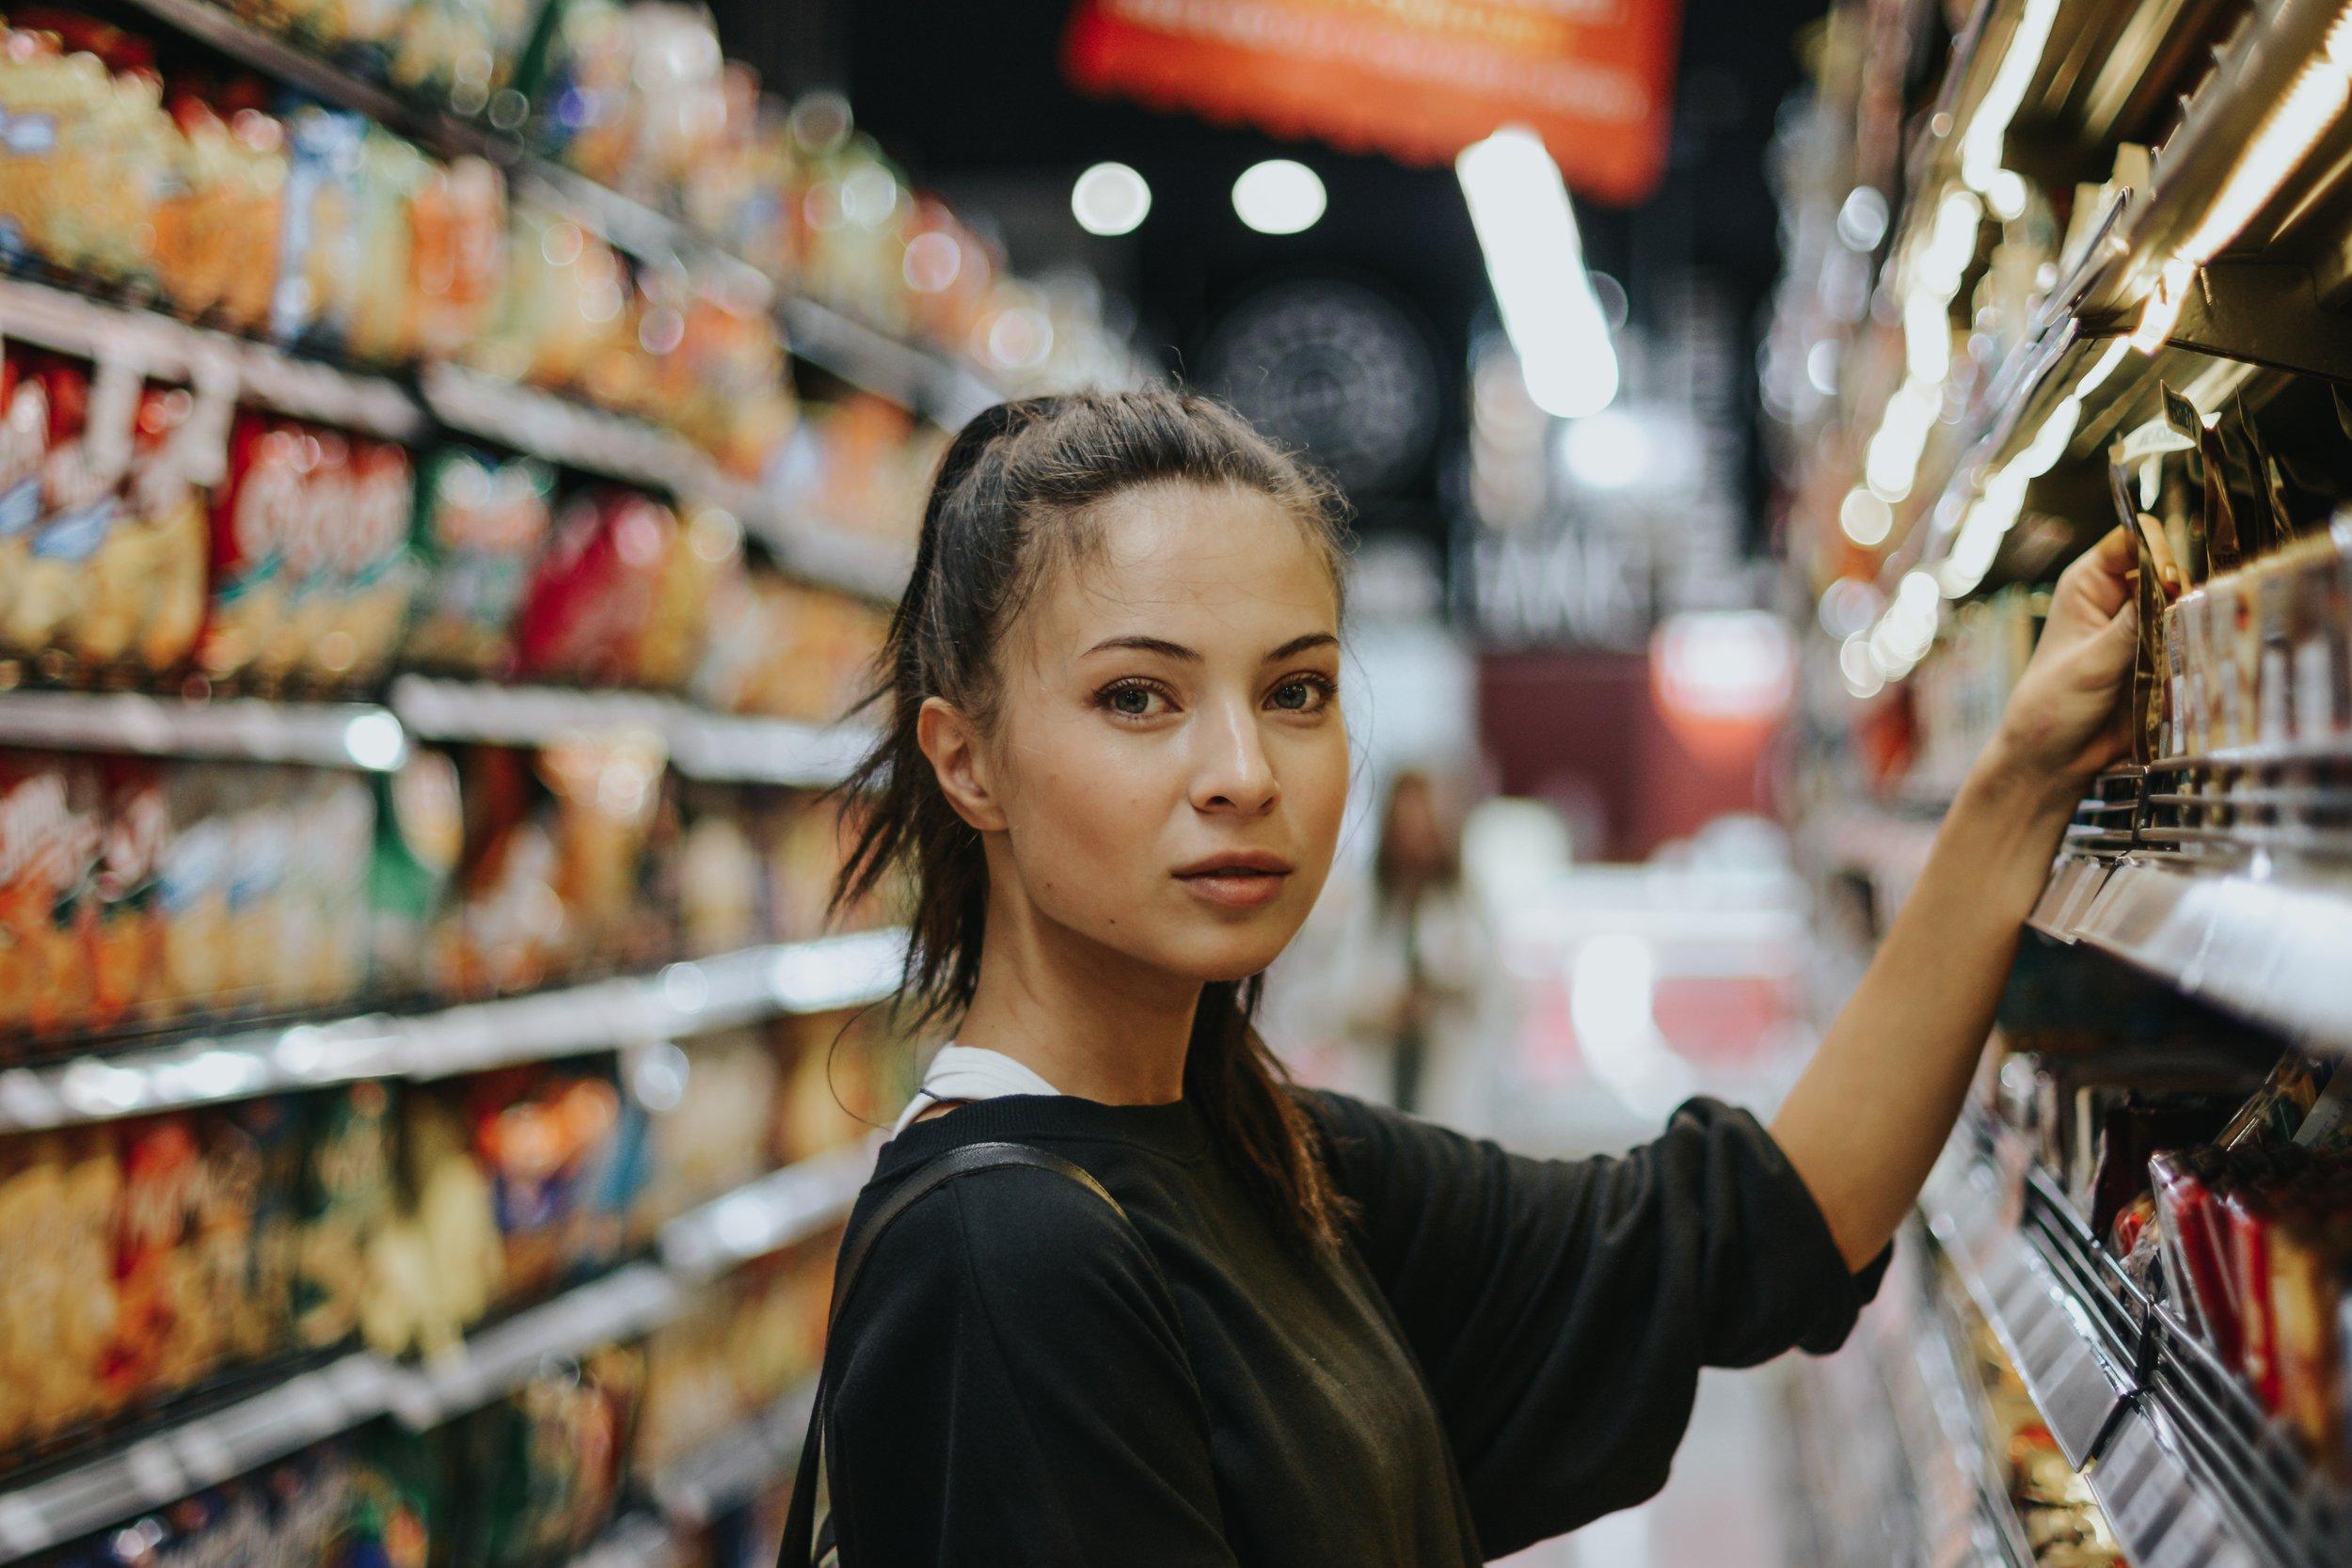 Economy and consumer confidence